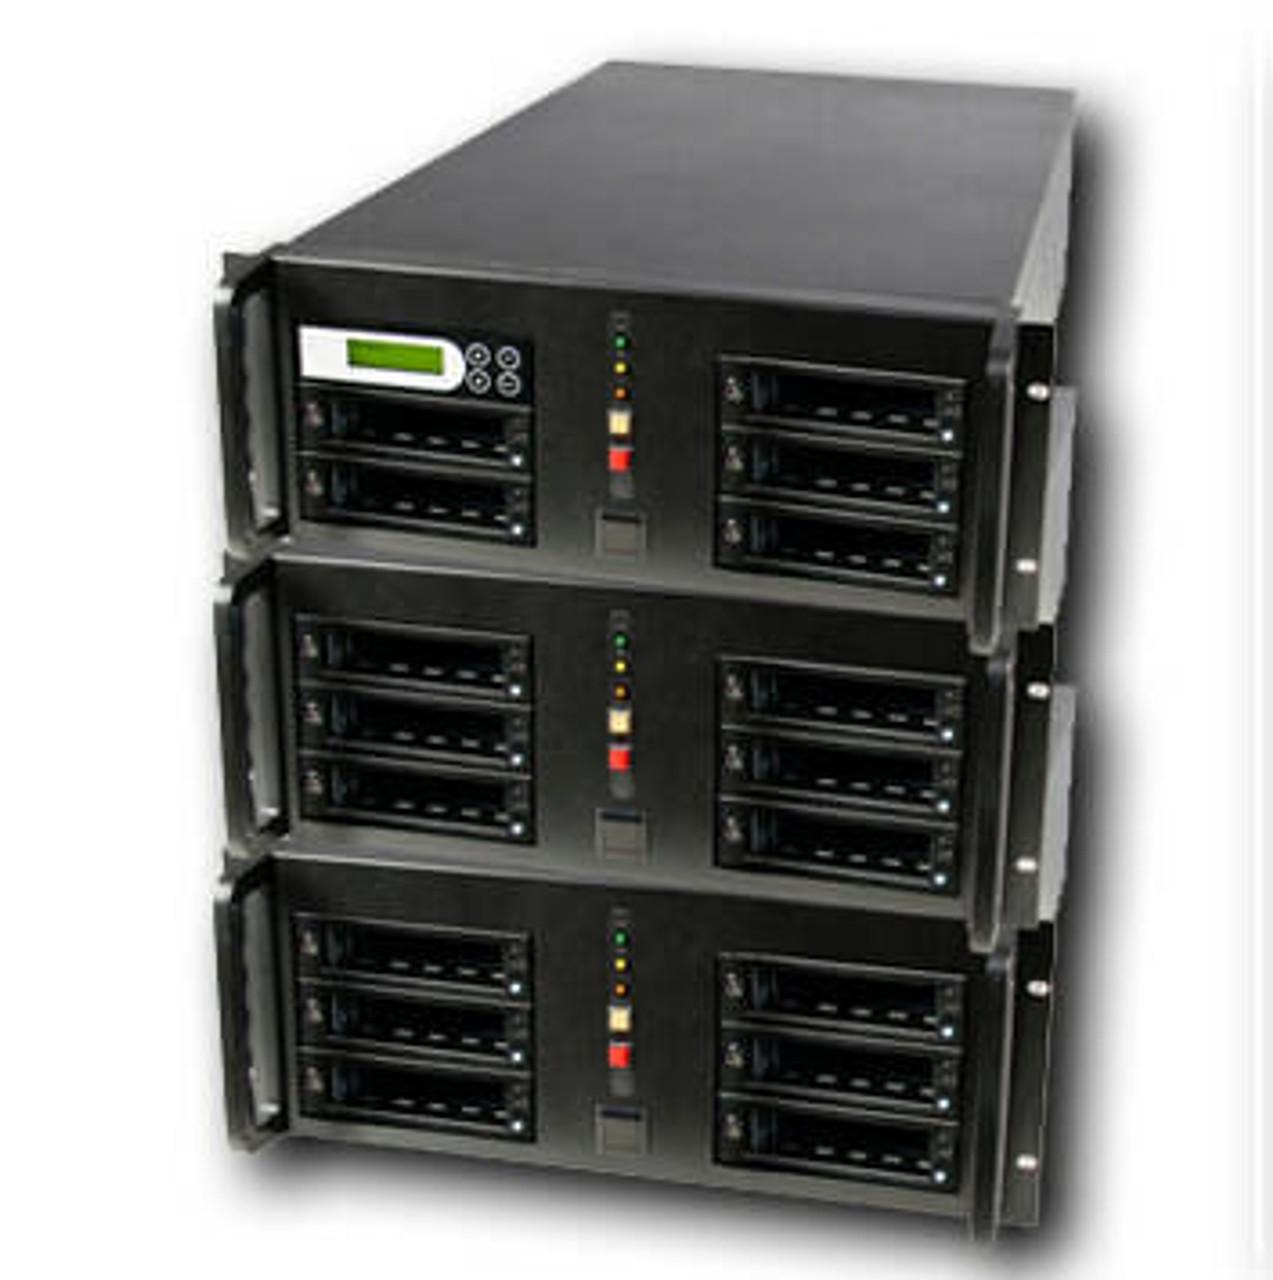 CinemaHDC CRU HDD/SSD Duplicator - DX115